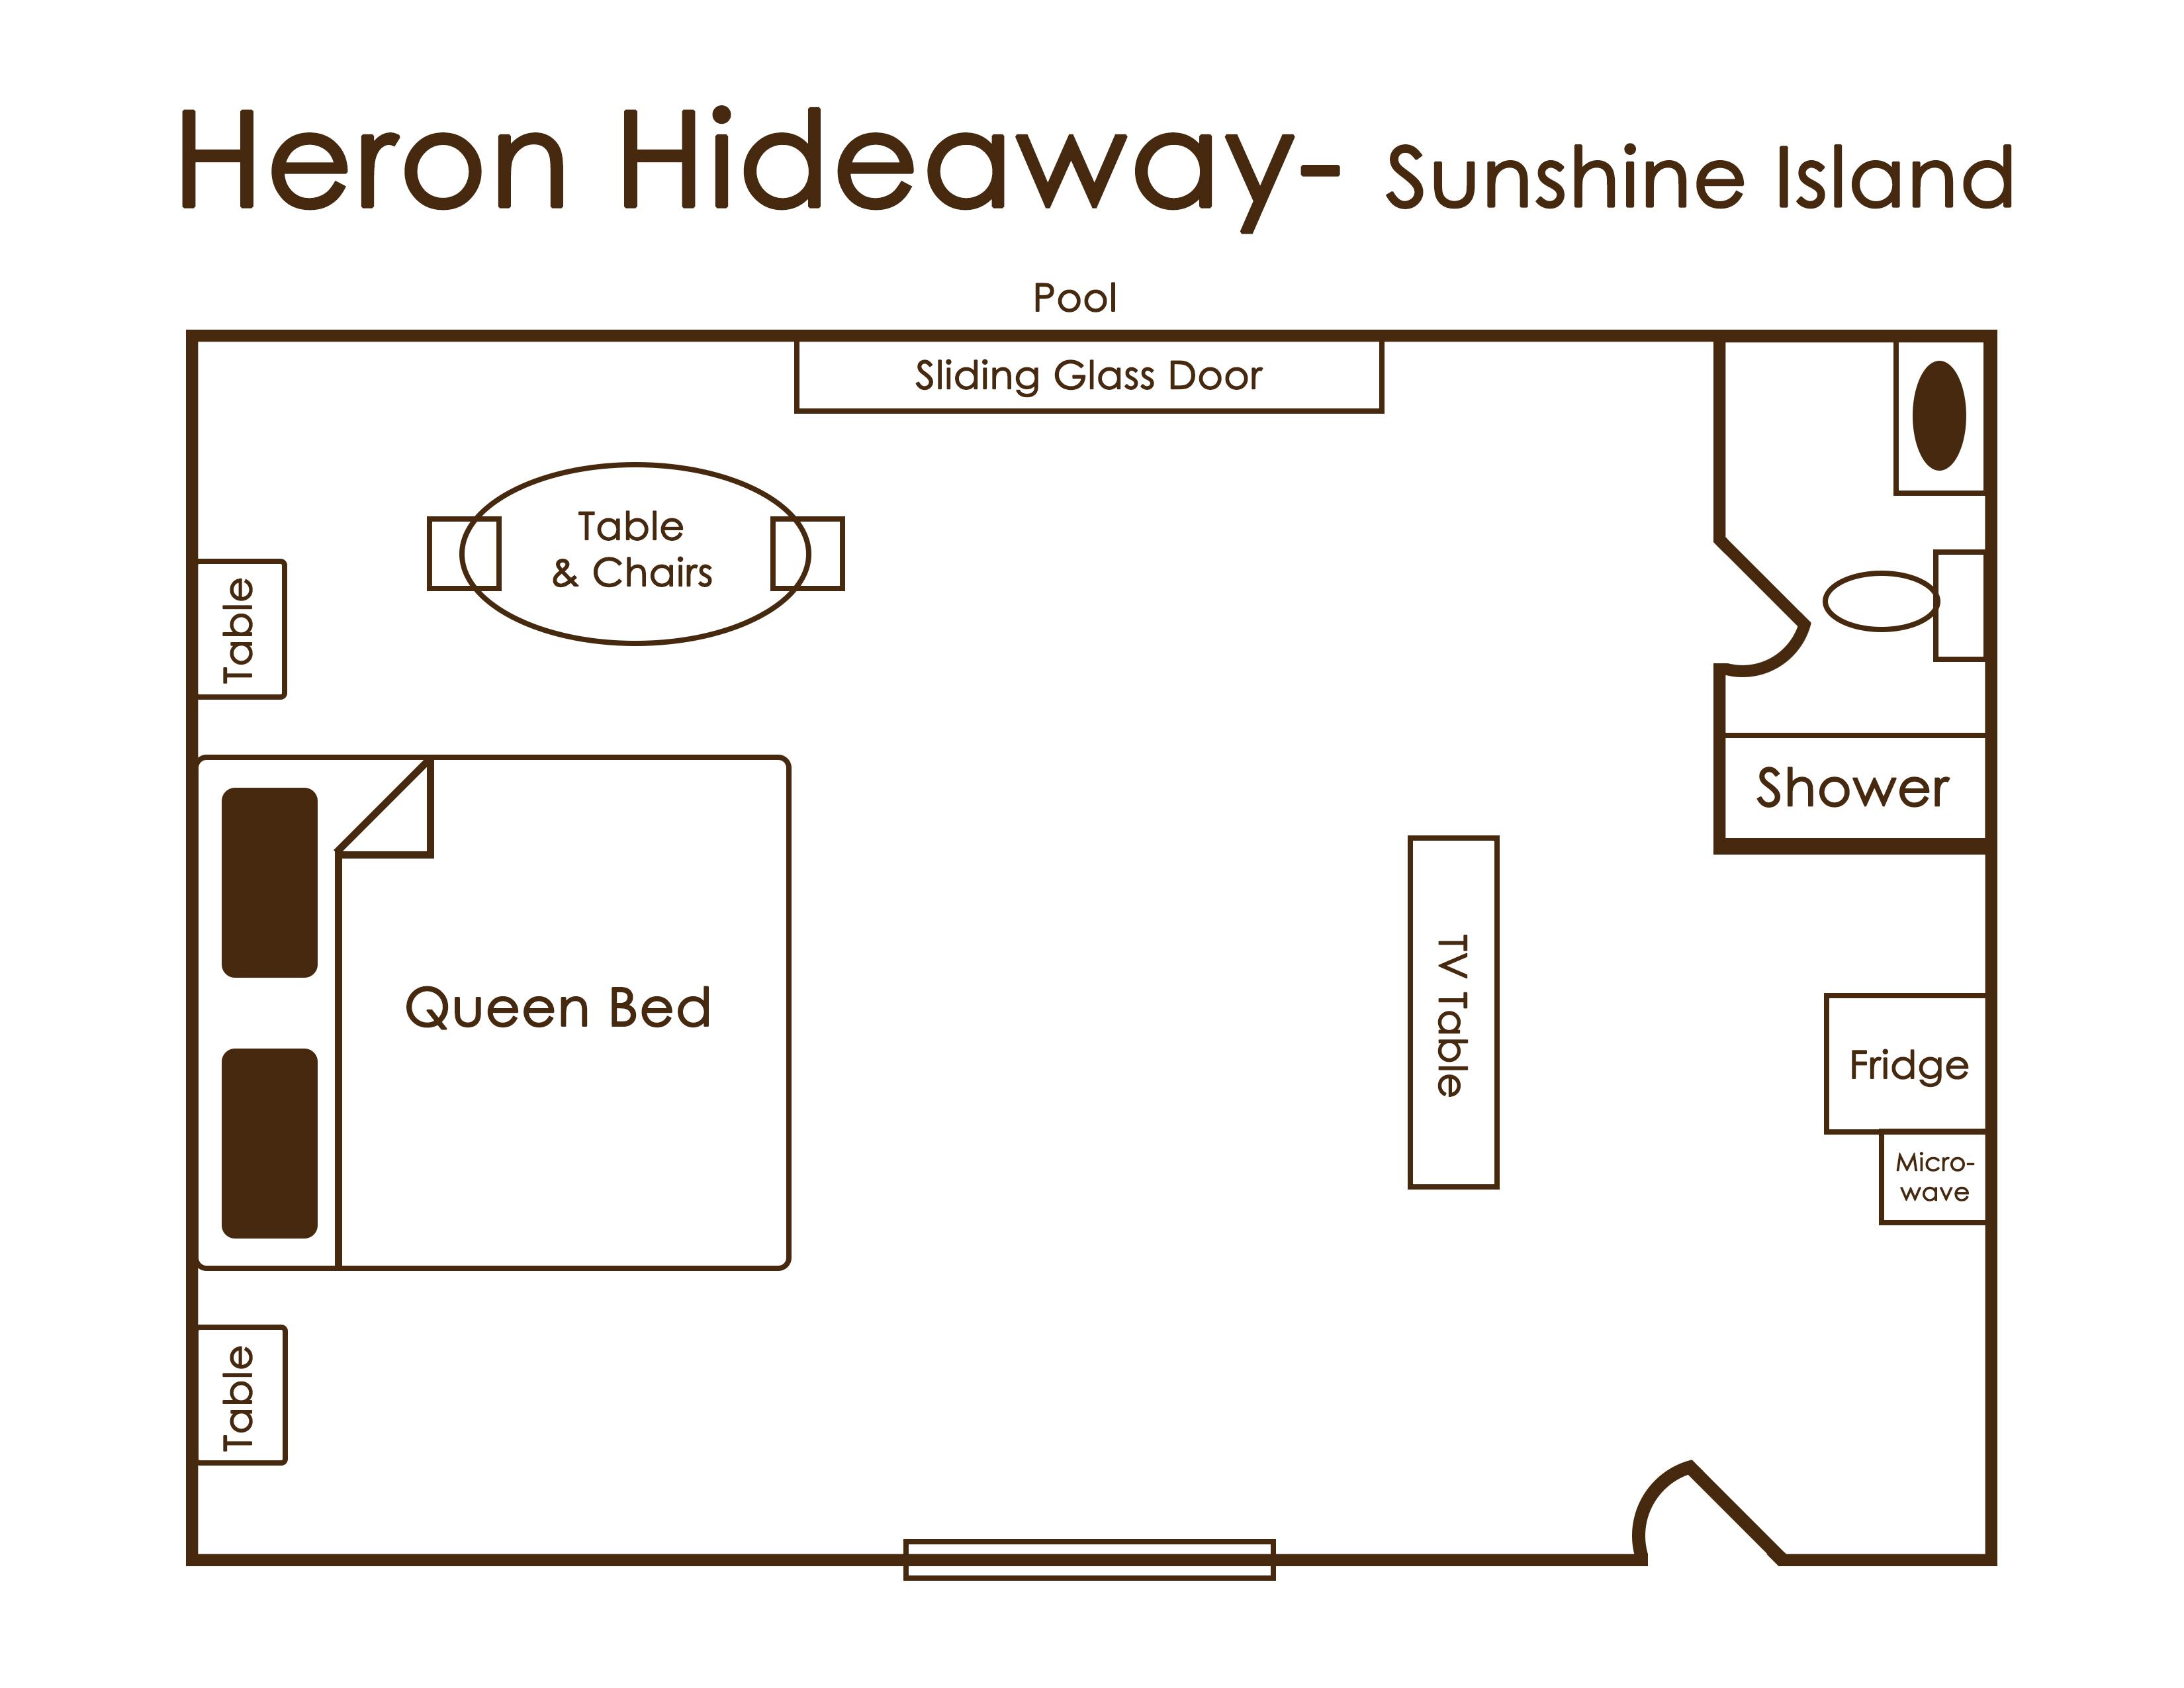 heron hideaway sunshine island